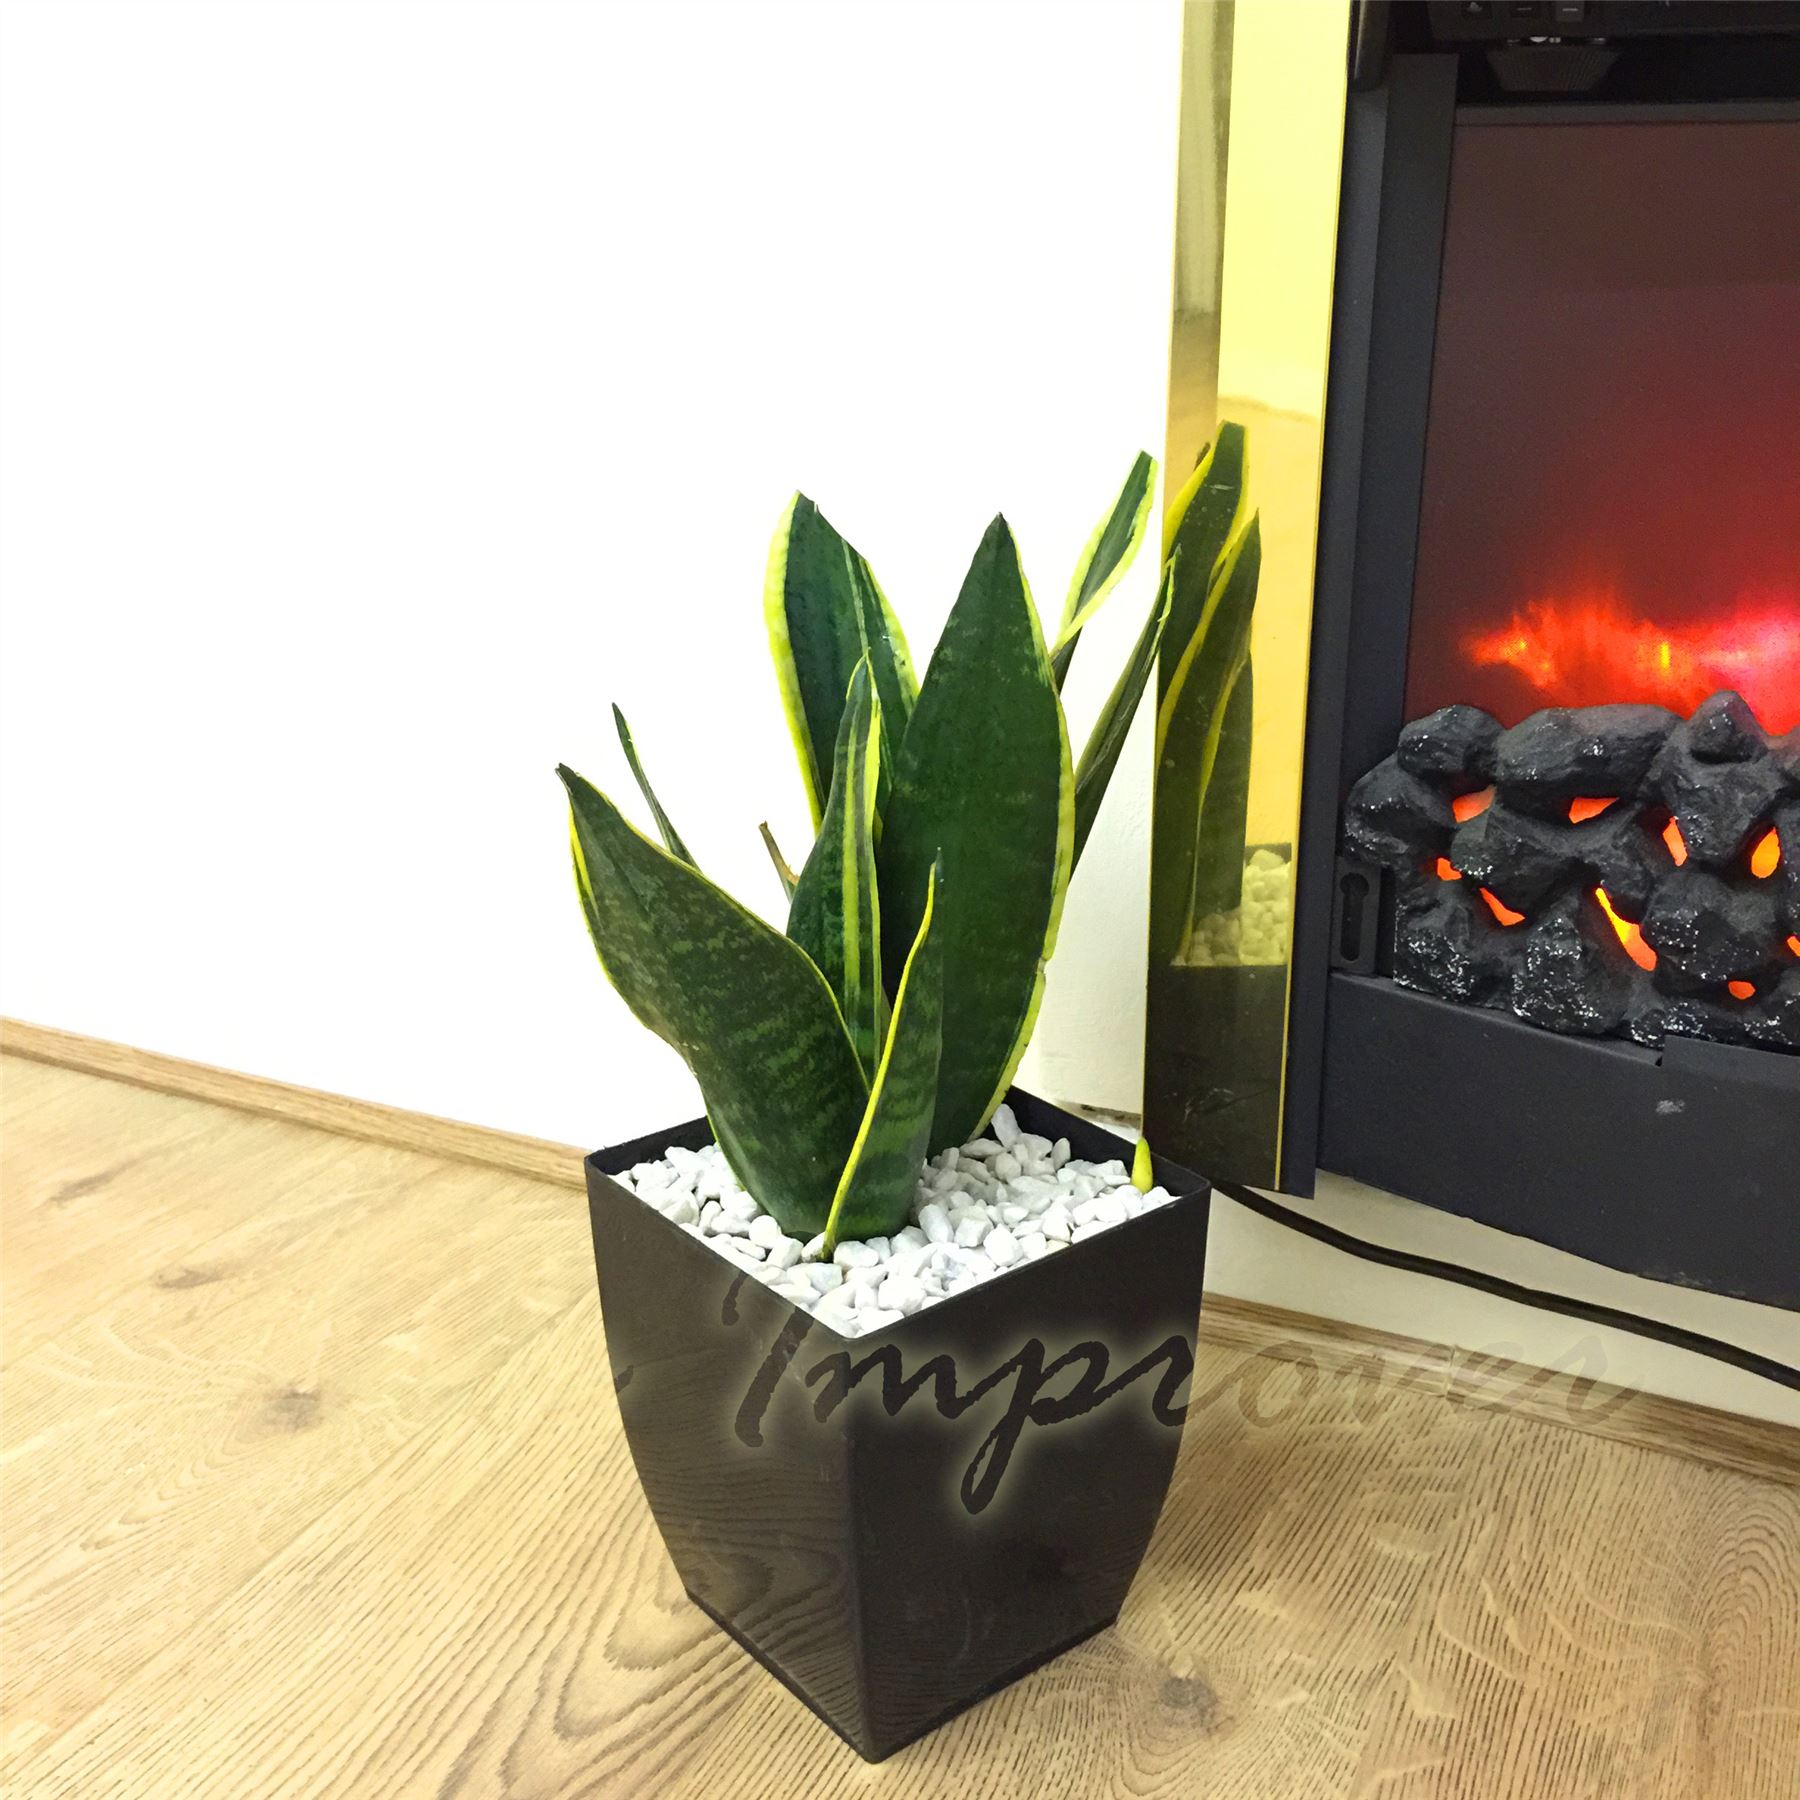 Tabella sempreverde pianta gloss black milano square pot - Pianta sempreverde da giardino ...